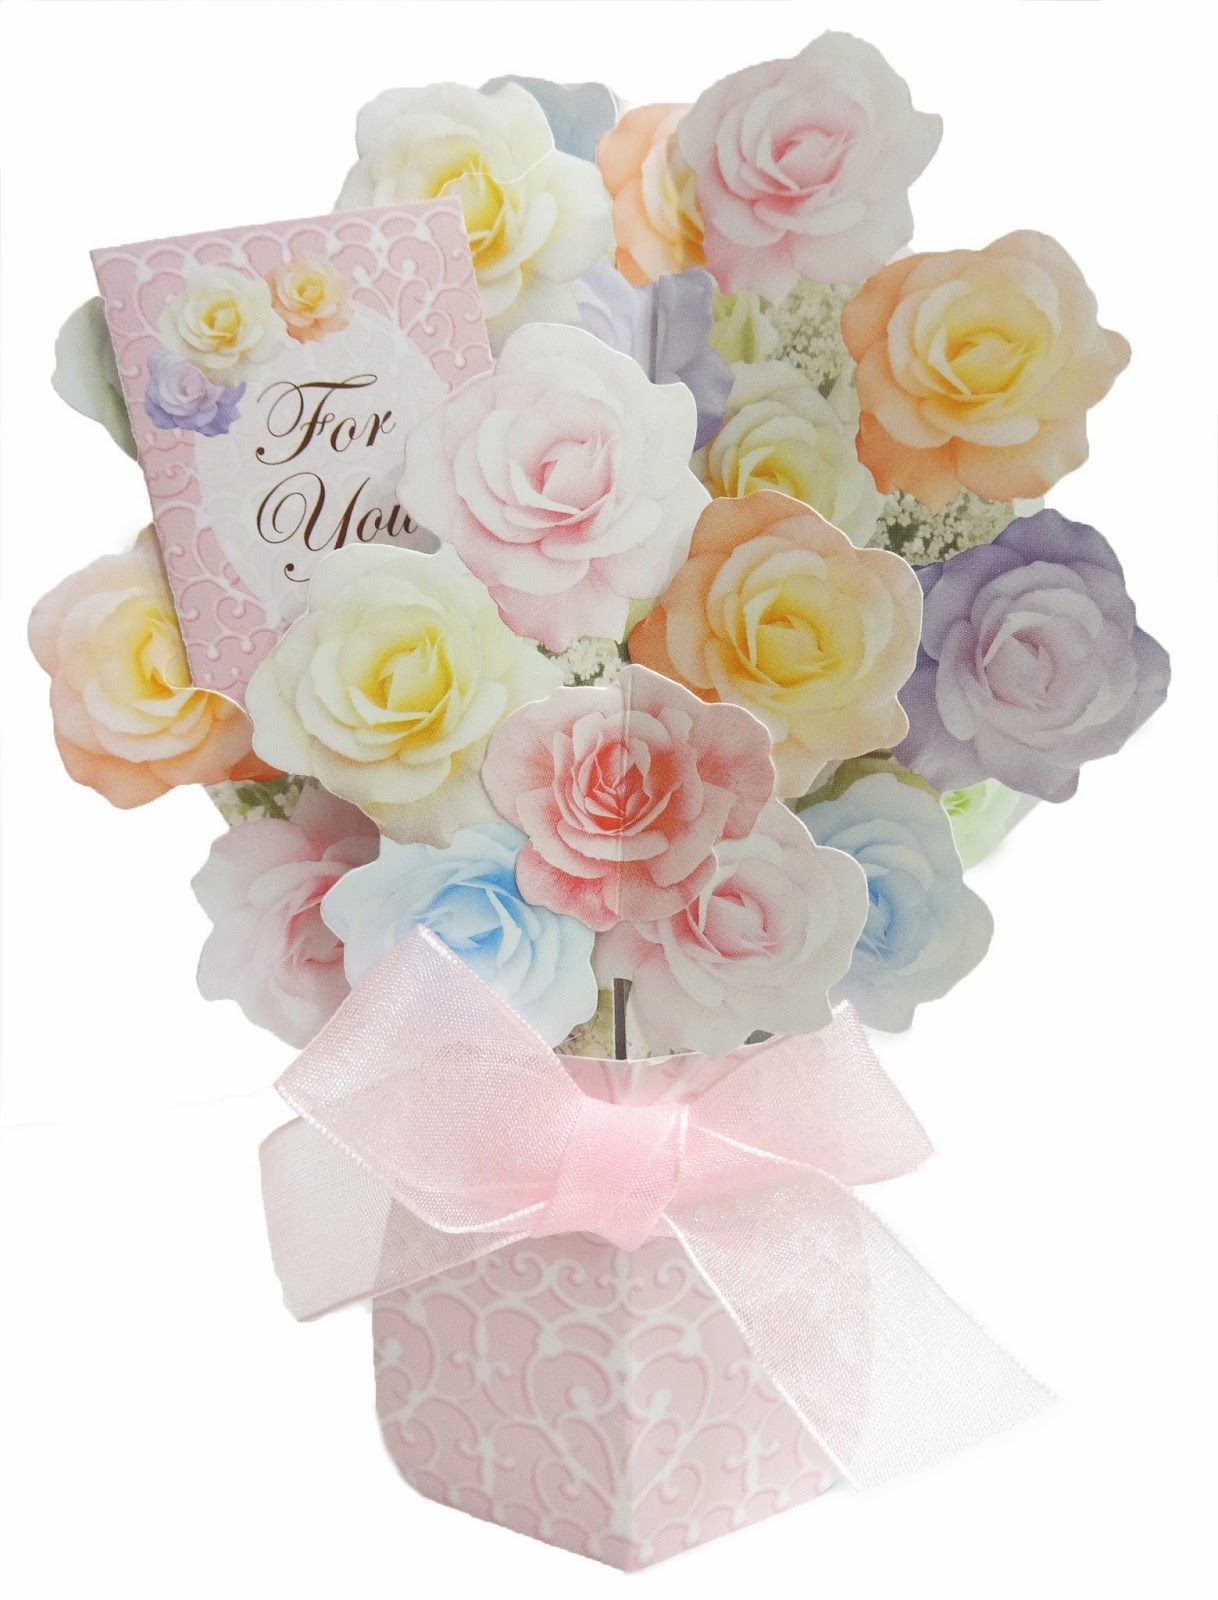 French Maison De Fleur House Of Flowers Collection Miss